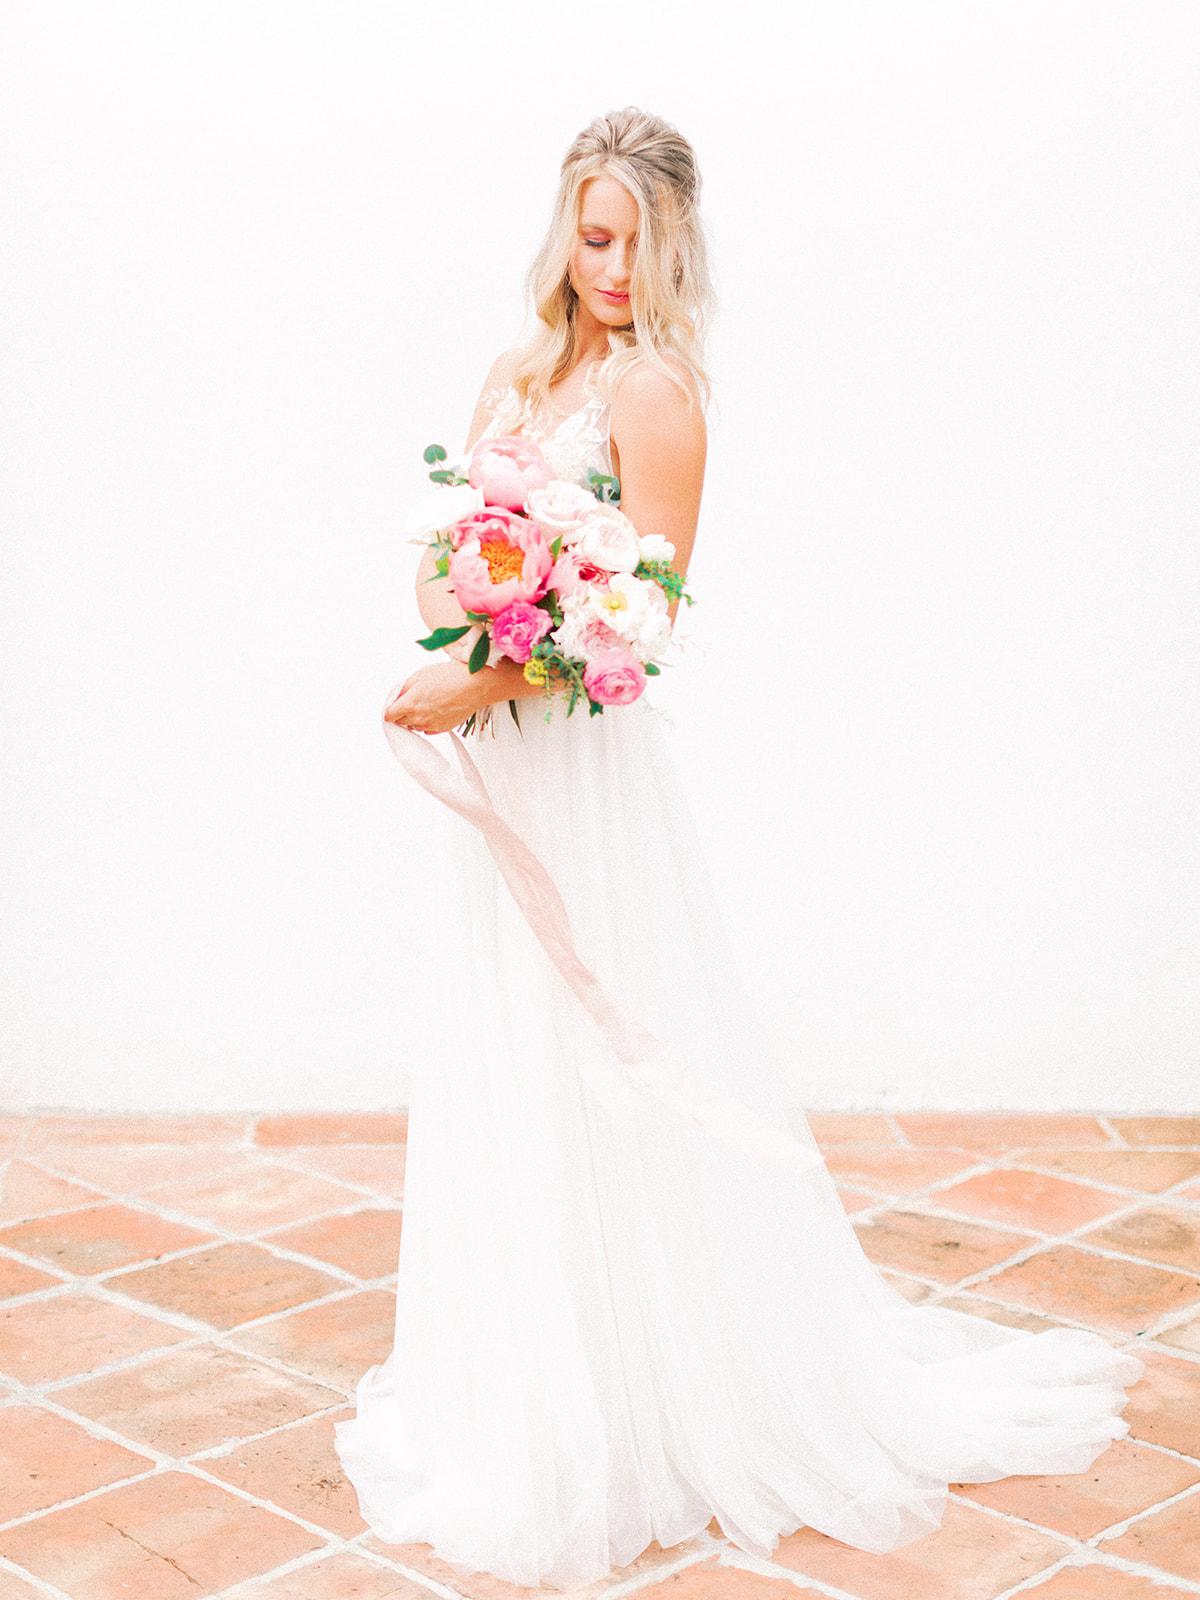 Romantic pink wedding bouquet: Beach Wedding Inspiration | Dominican Republic